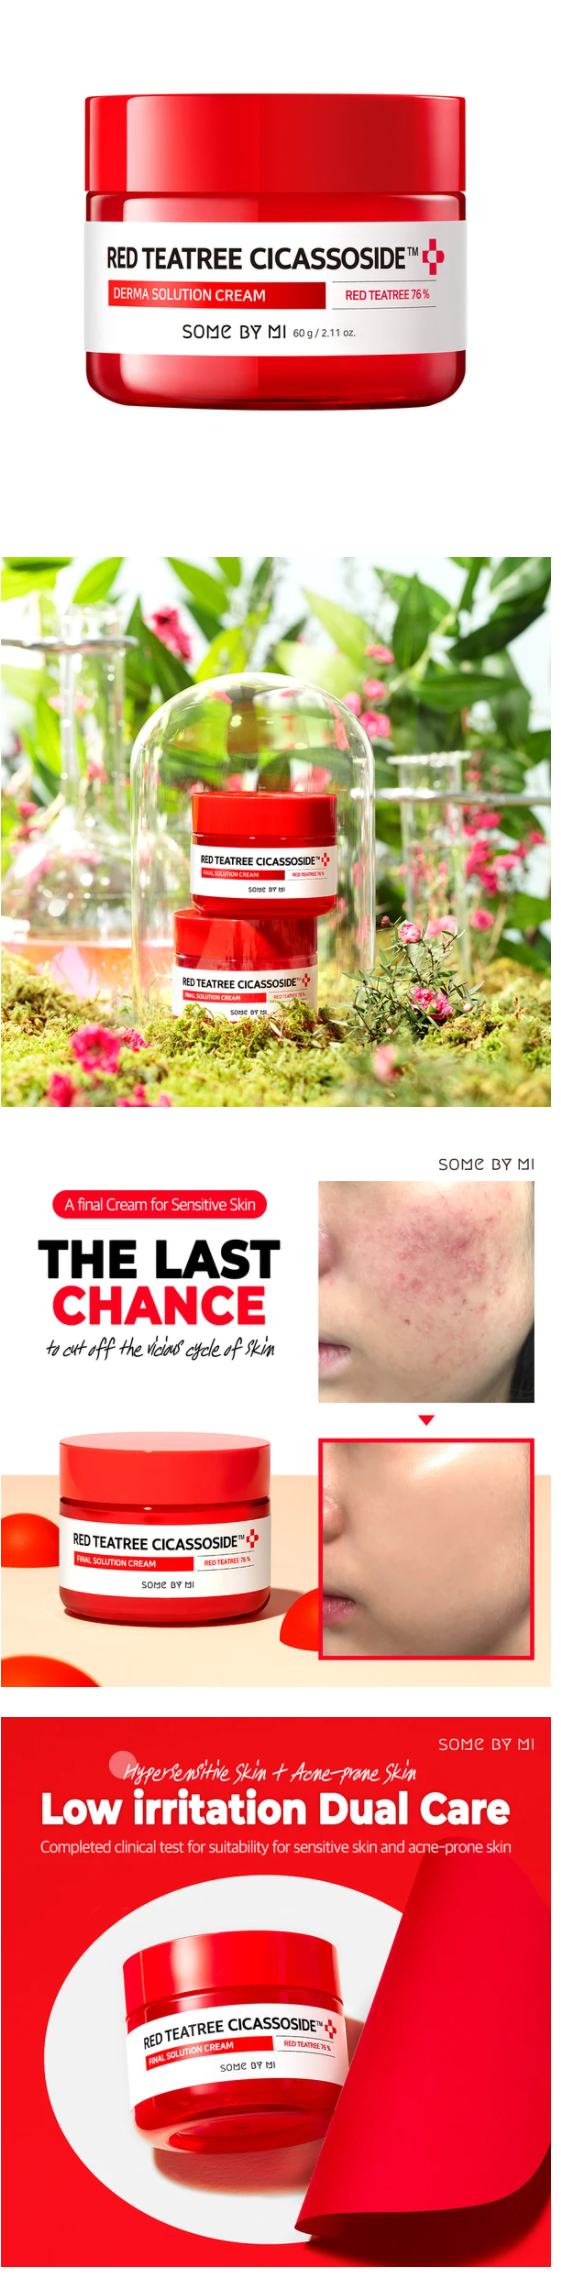 SOMEBYMI-Red TeaTree- Cicassoside-Cream-60g.png